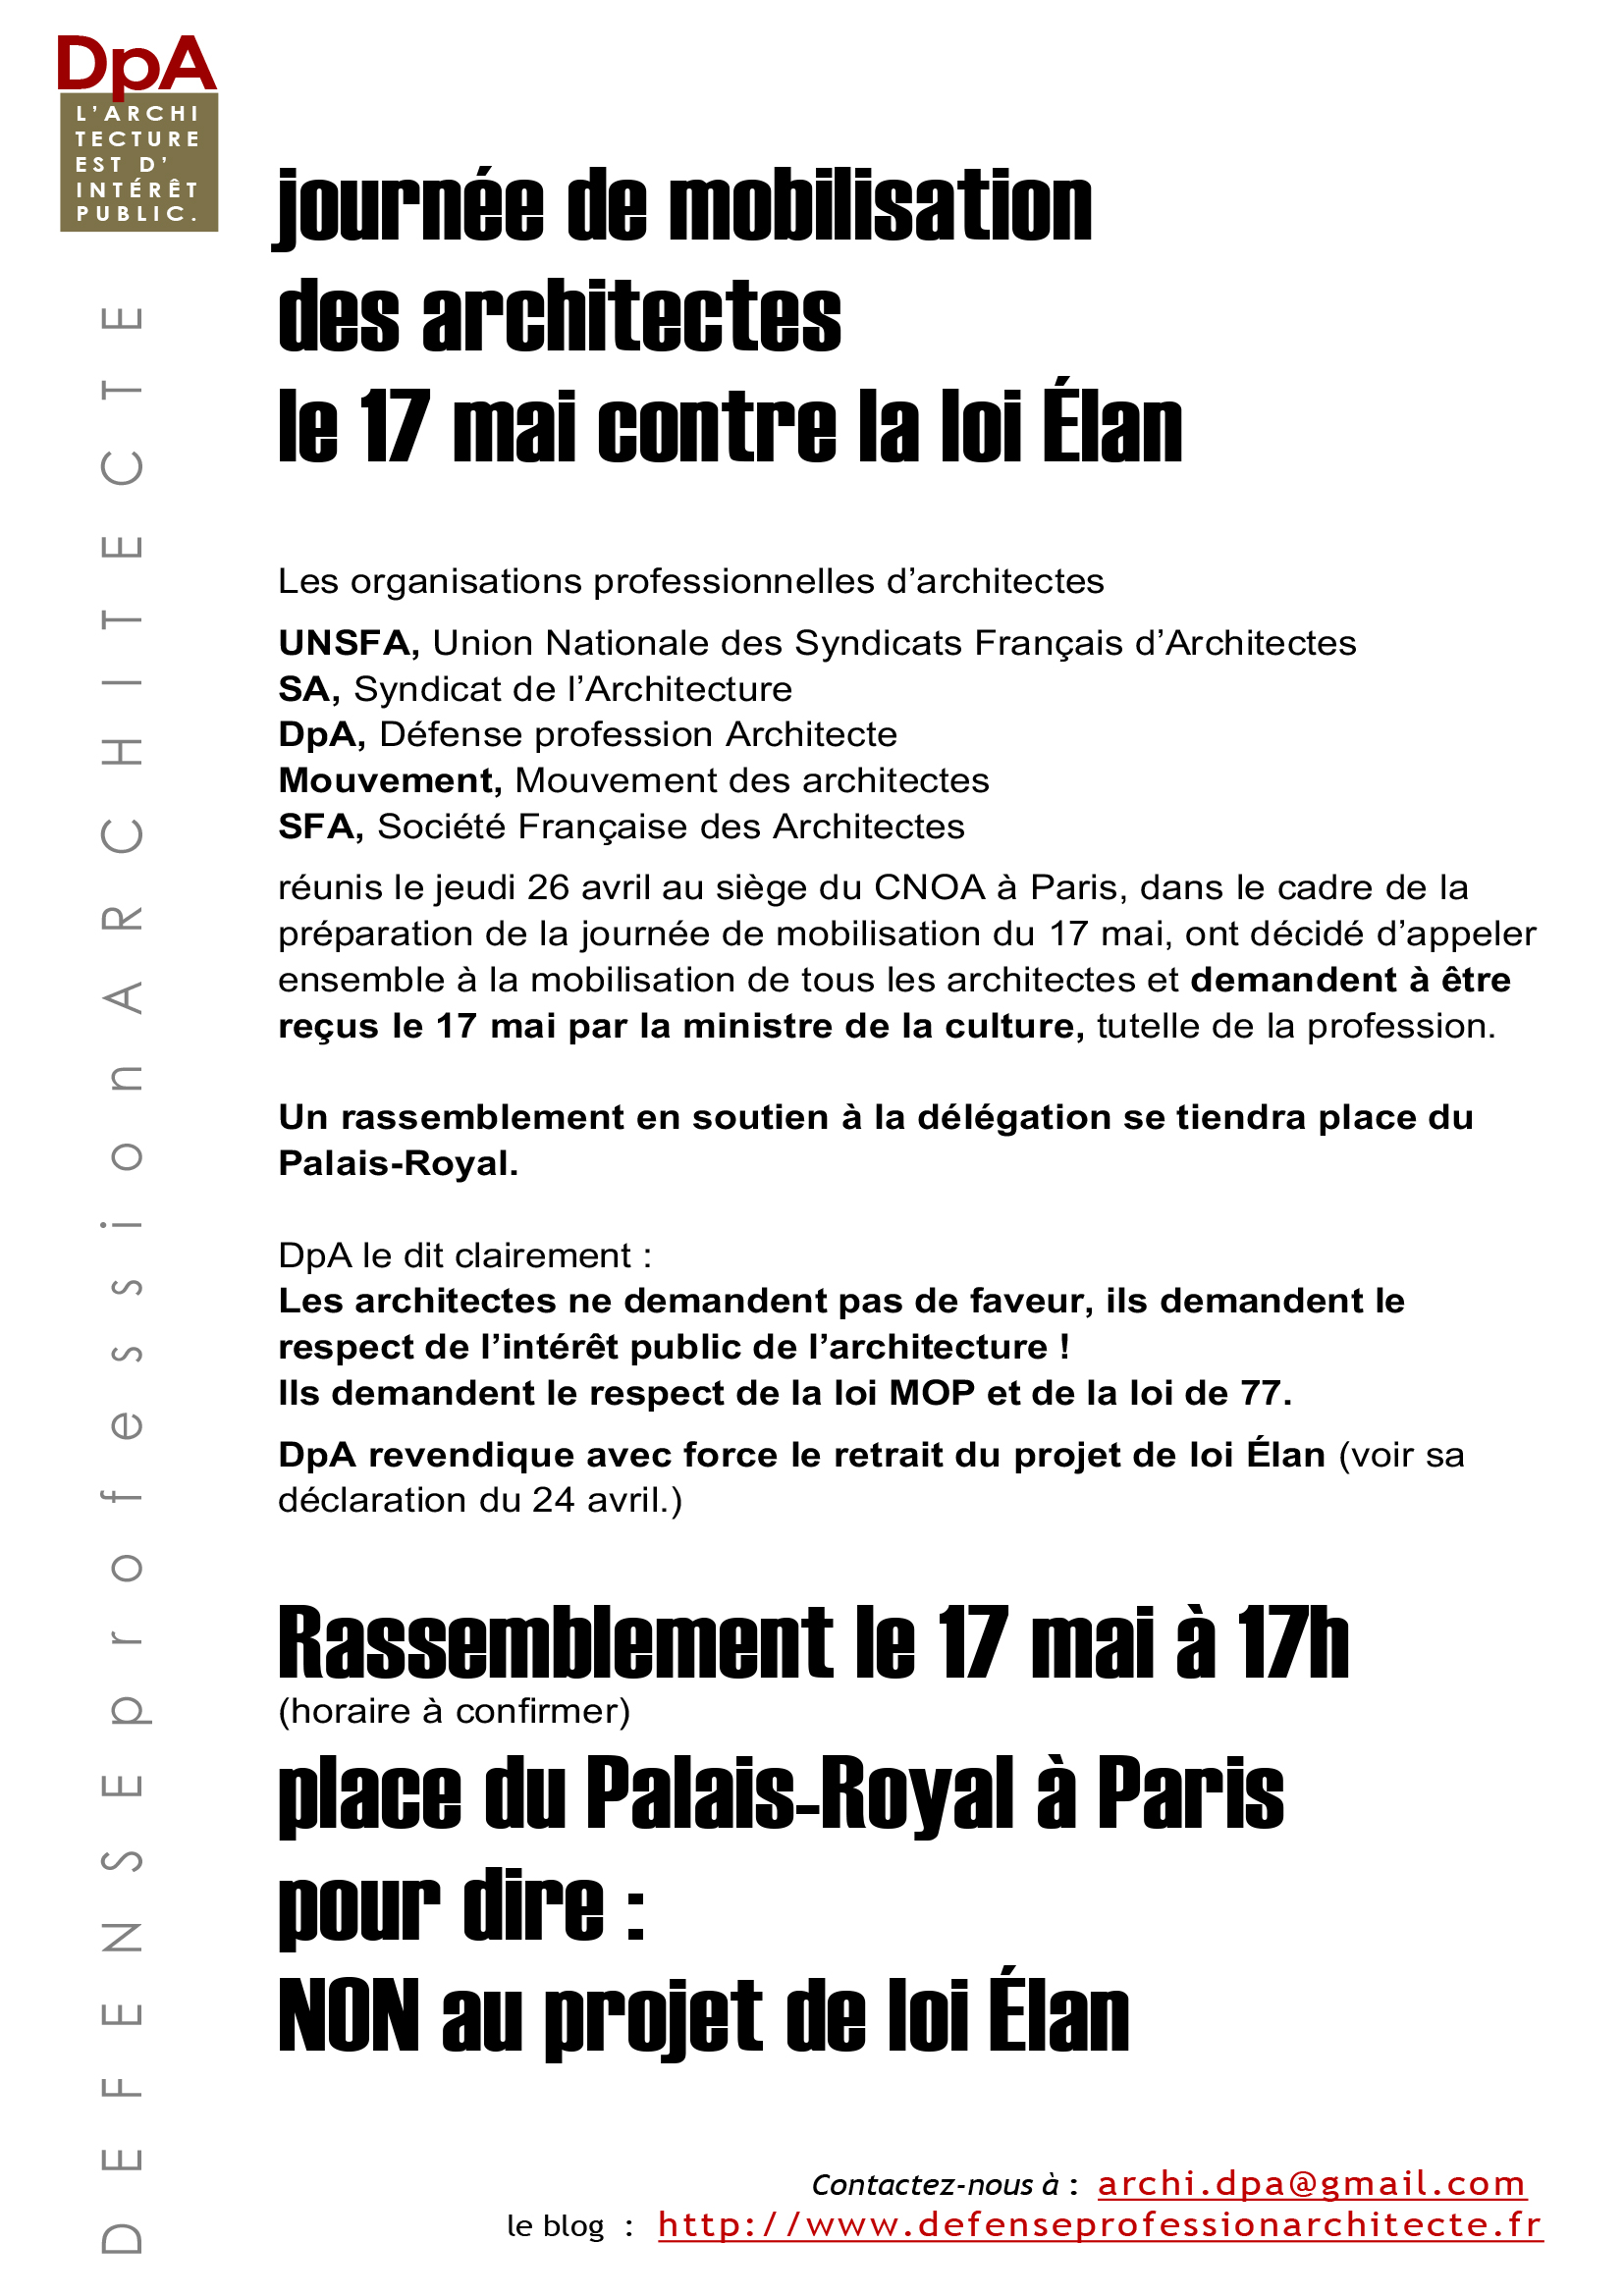 Appel mobilisation 17 mai